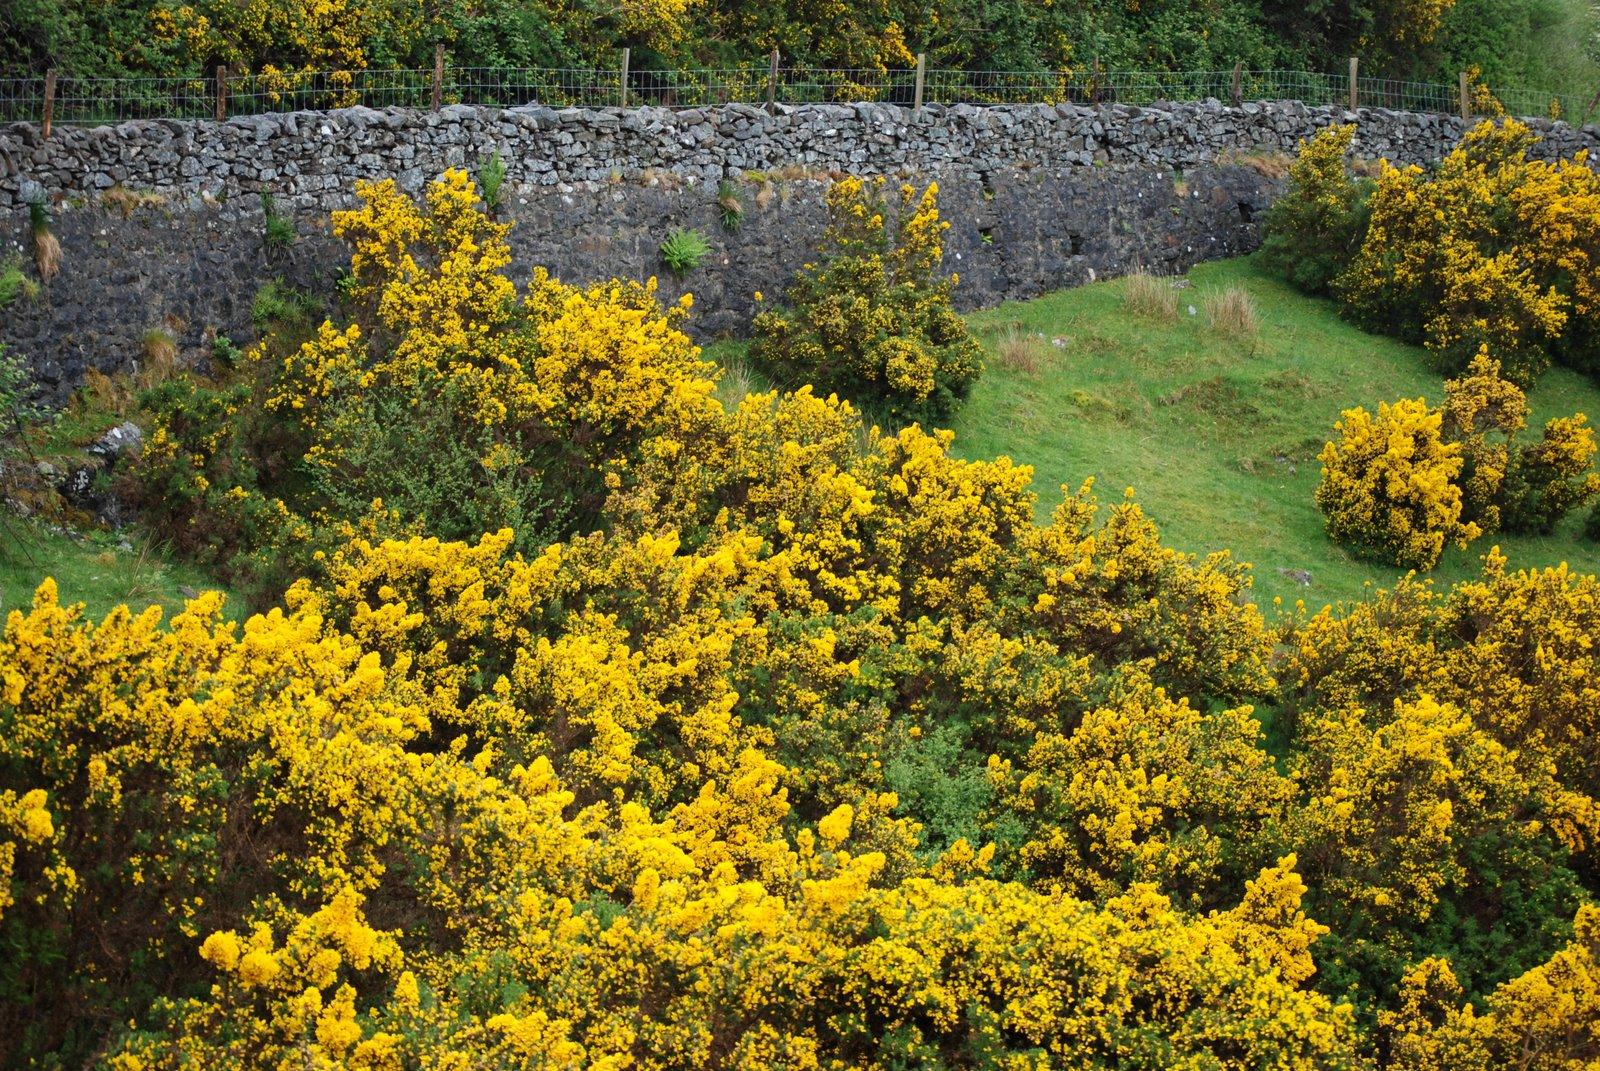 golden-yellow gorse, or furze, bushes in Ireland